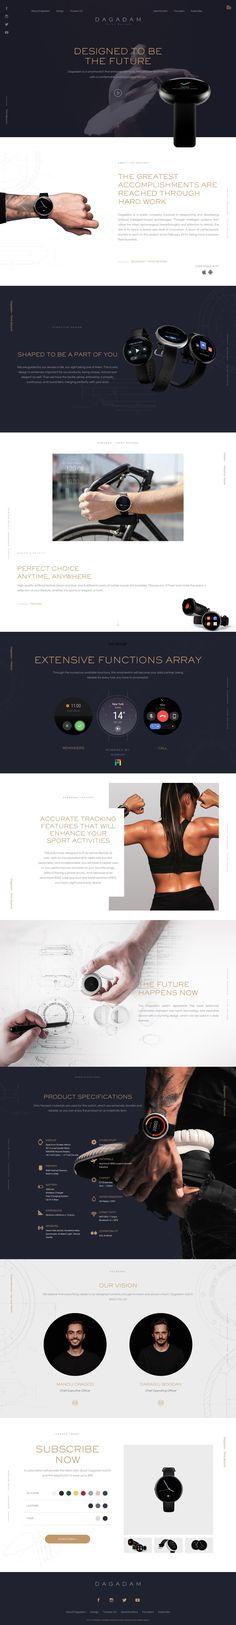 Dagadam landing page design inspiration - Lapa Ninja Best Landing Page Design, Landing Page Examples, Ux Design, Layout Design, Website Layout, Web Design Inspiration, Cool Designs, Ninja, Website Designs